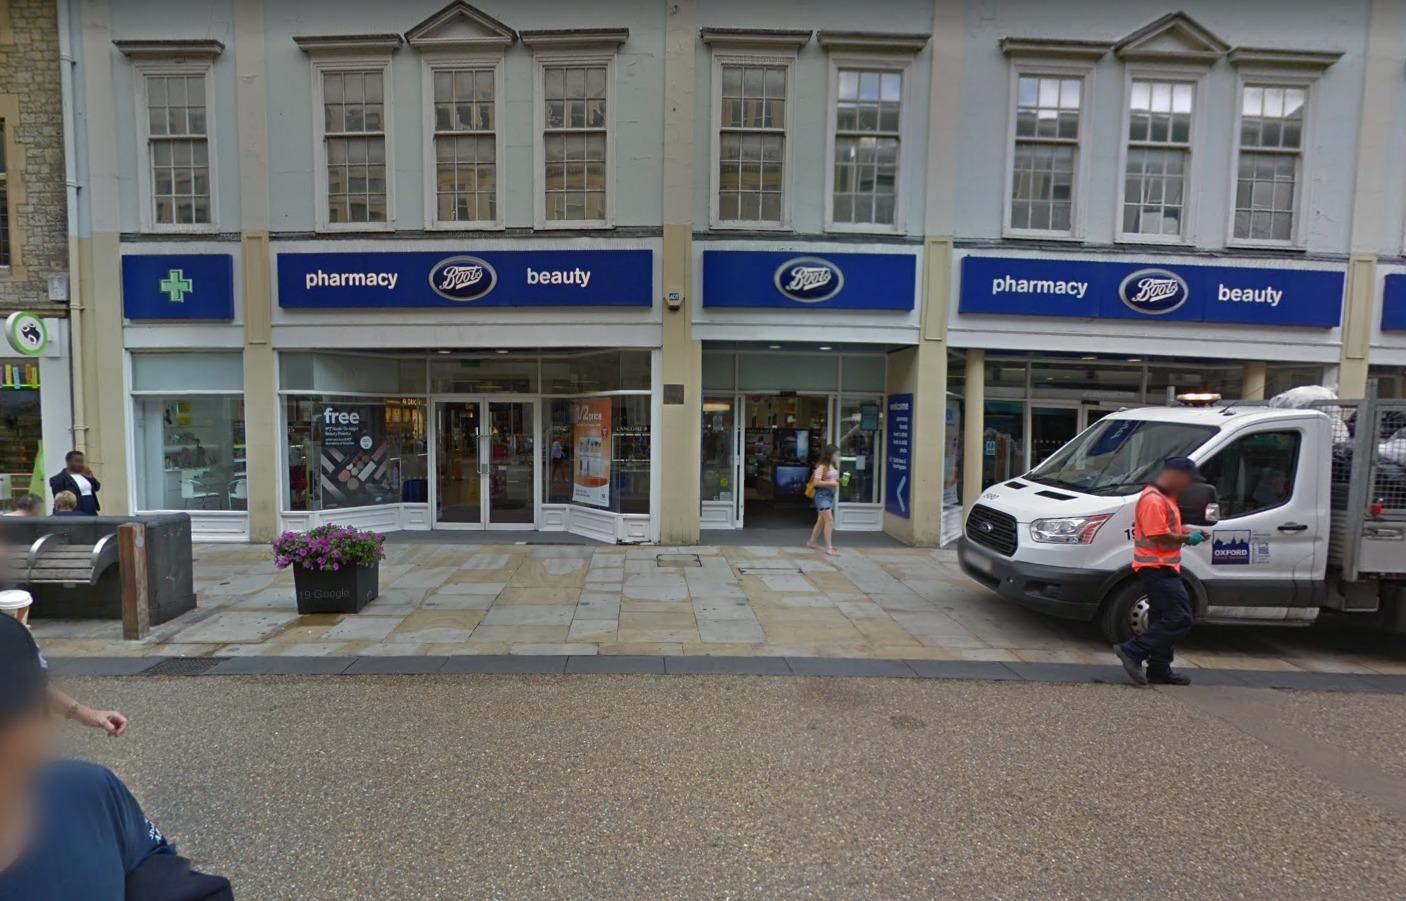 Prolific thief stole £5,000 worth of designer skin care